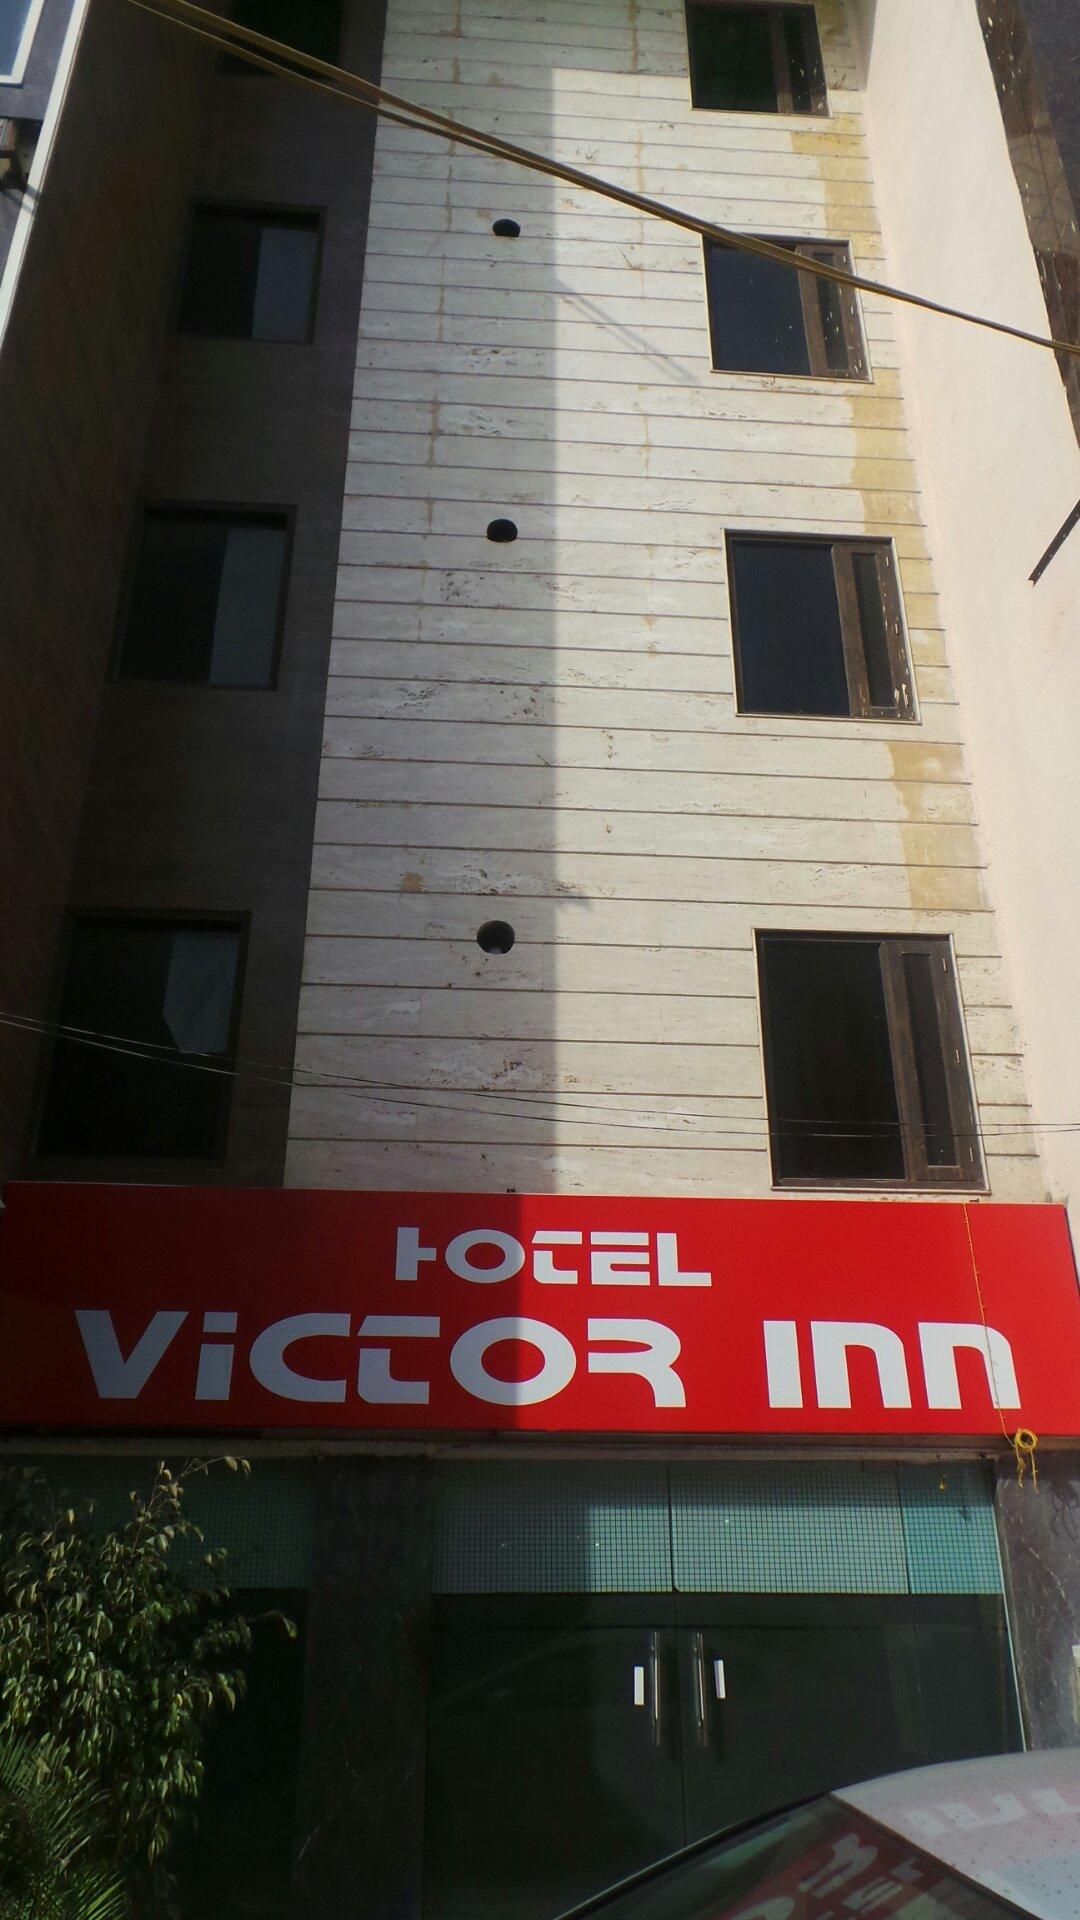 Hotel Victor Inn in New Delhi